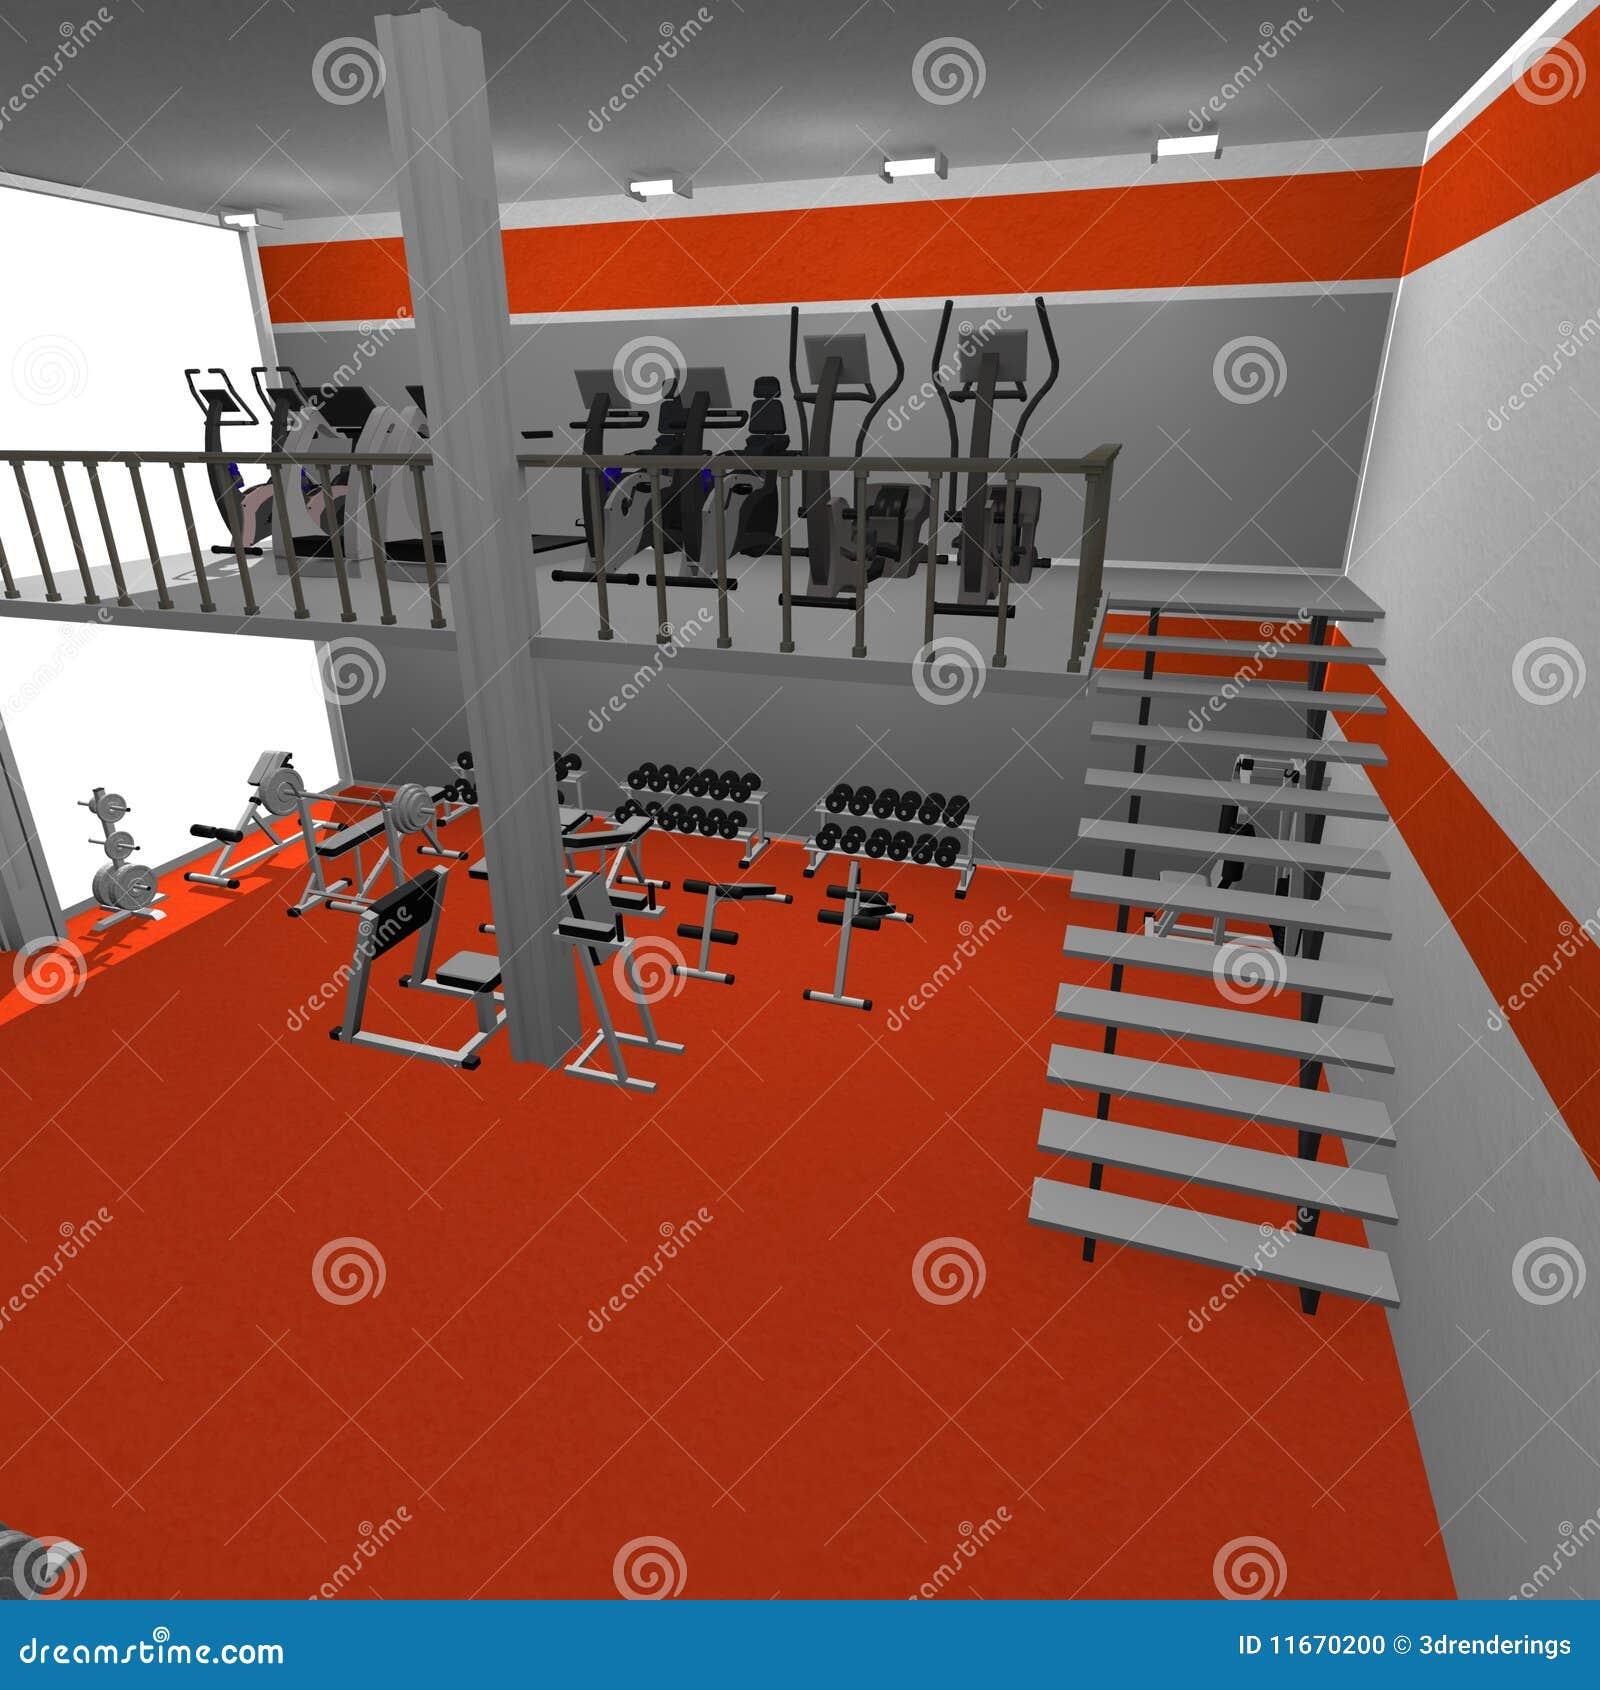 Gym interior stock illustration  Illustration of bodybuilding - 11670200